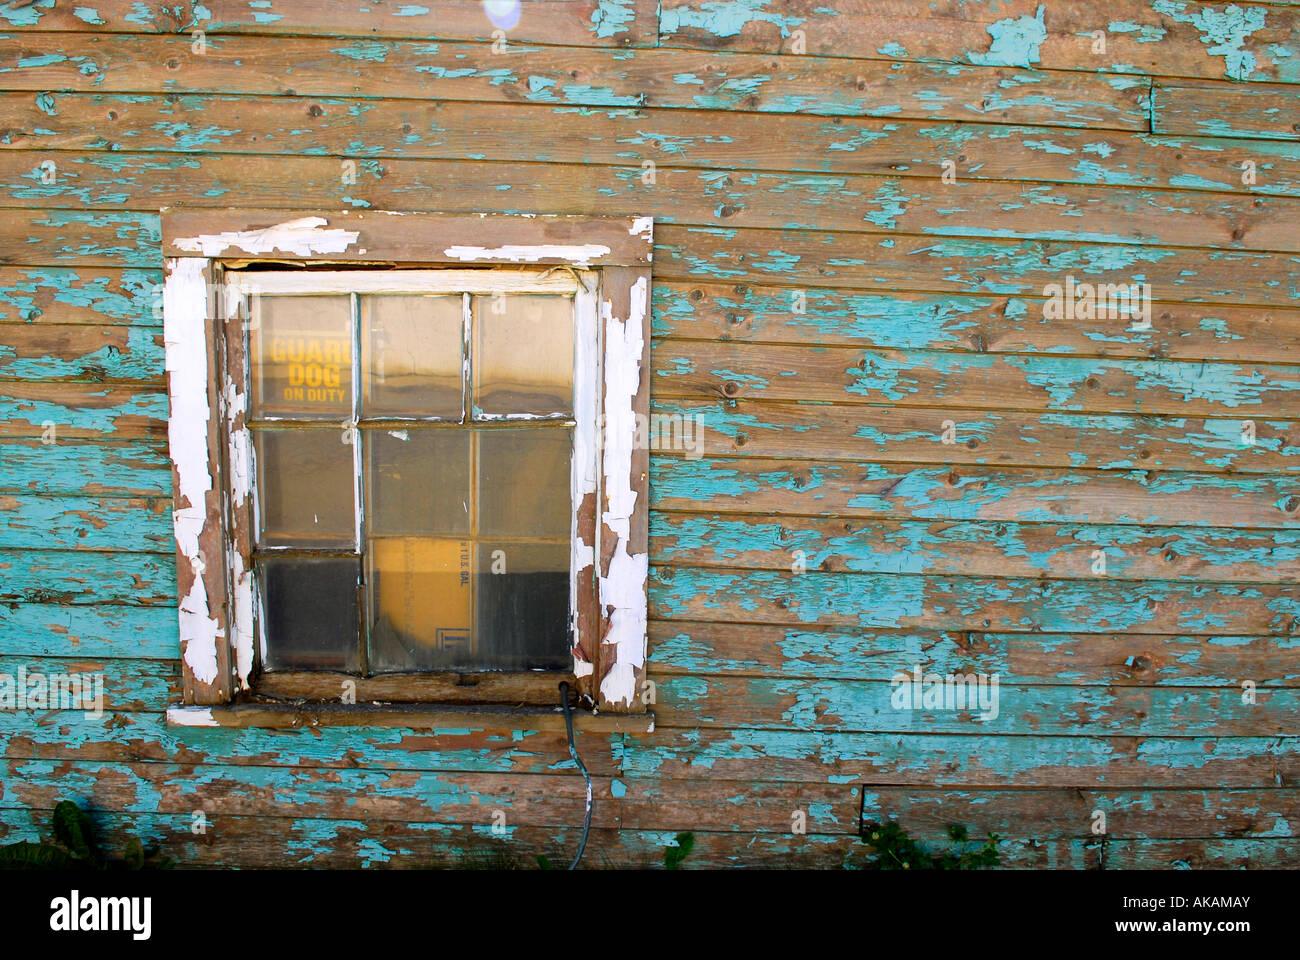 Old Building Peeling Peel Paint Worn Disrepair Town of Hythe Alberta Canada Blue Green Aqua - Stock Image